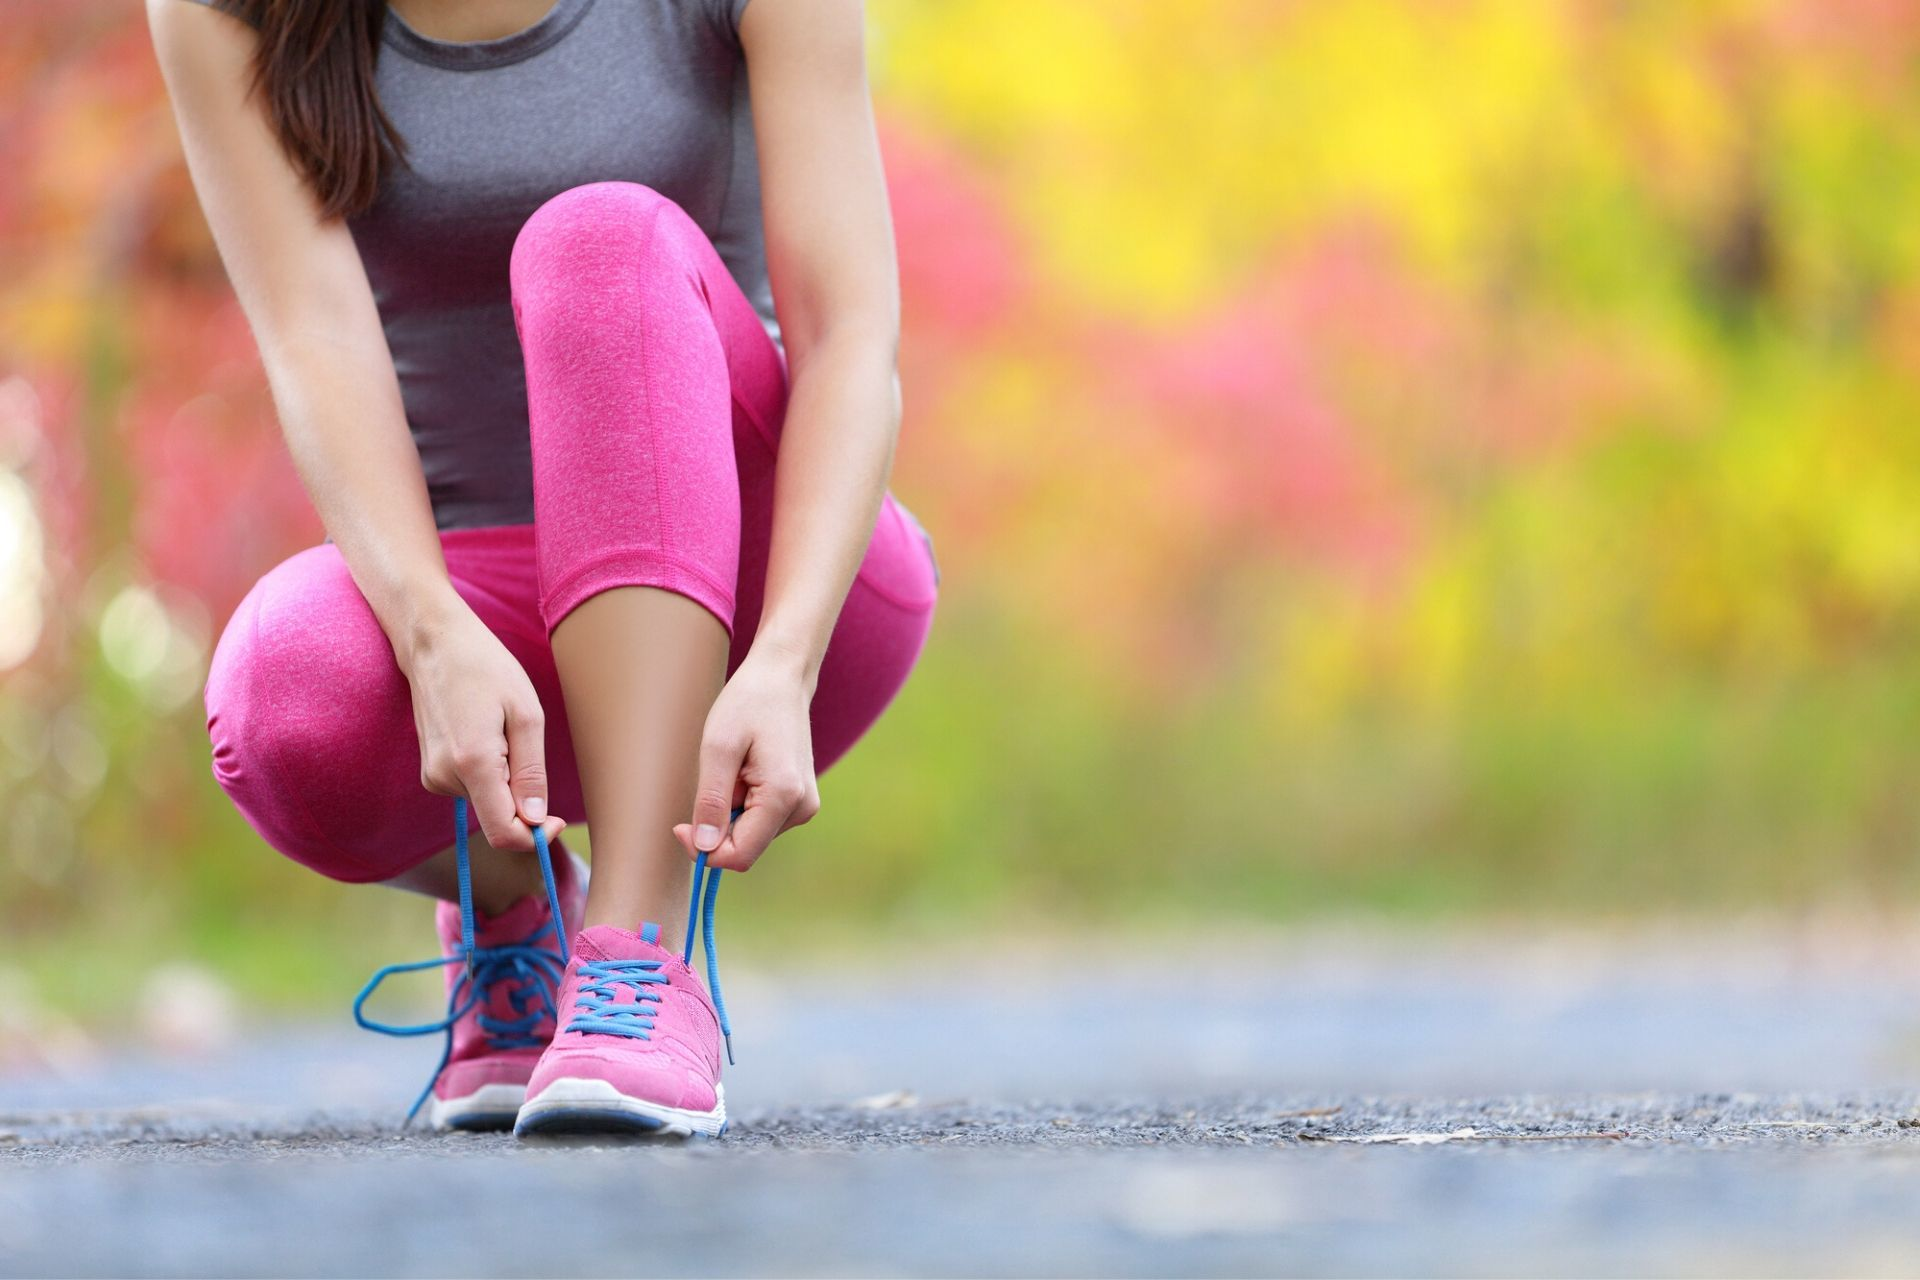 Katherine Runs a Half Marathon: The Story of a Princess' Disney Journey